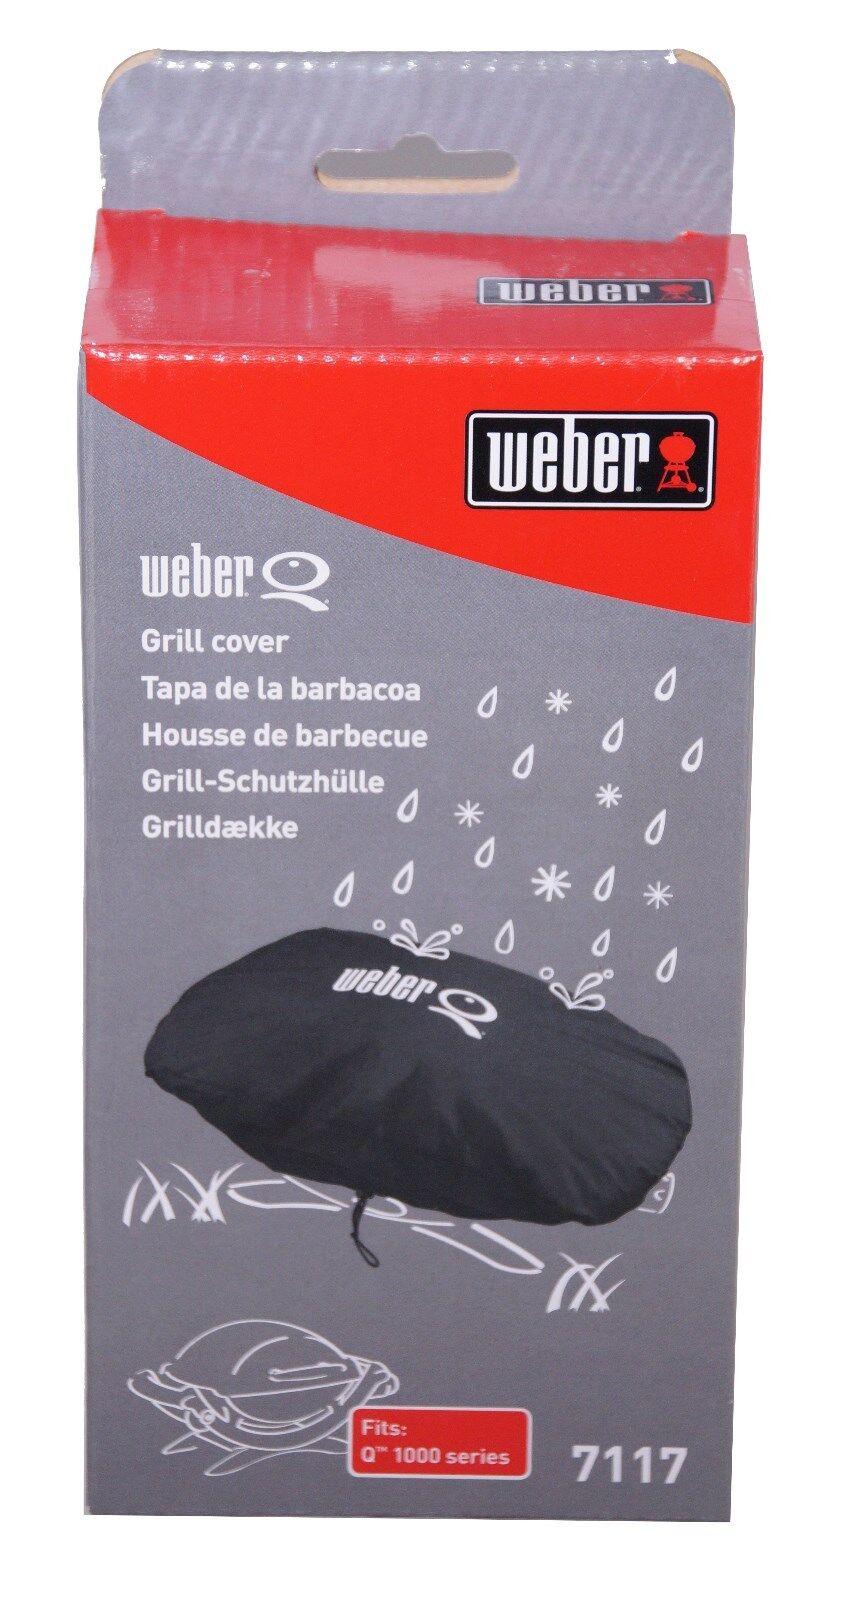 Weber Abdeckhaube Standard Q100 Q120 Q140 Q1000 Q1200 Q1400 Grillabdeckung BBQ